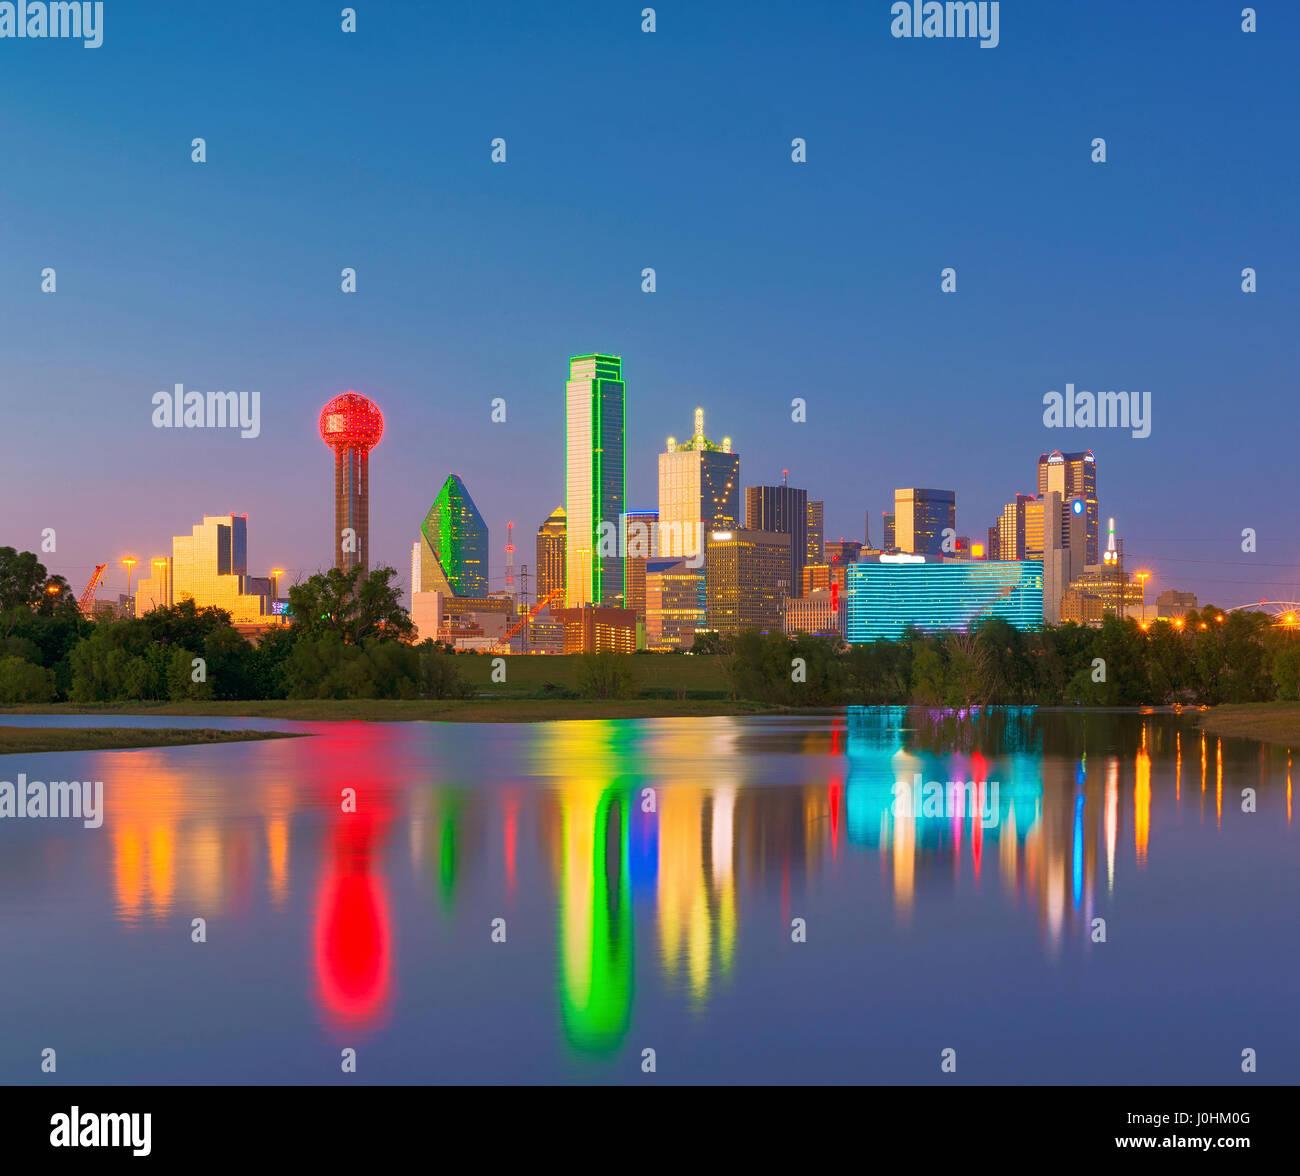 dallas skyline reflection at dawn downtown dallas texas usa J0HM0G